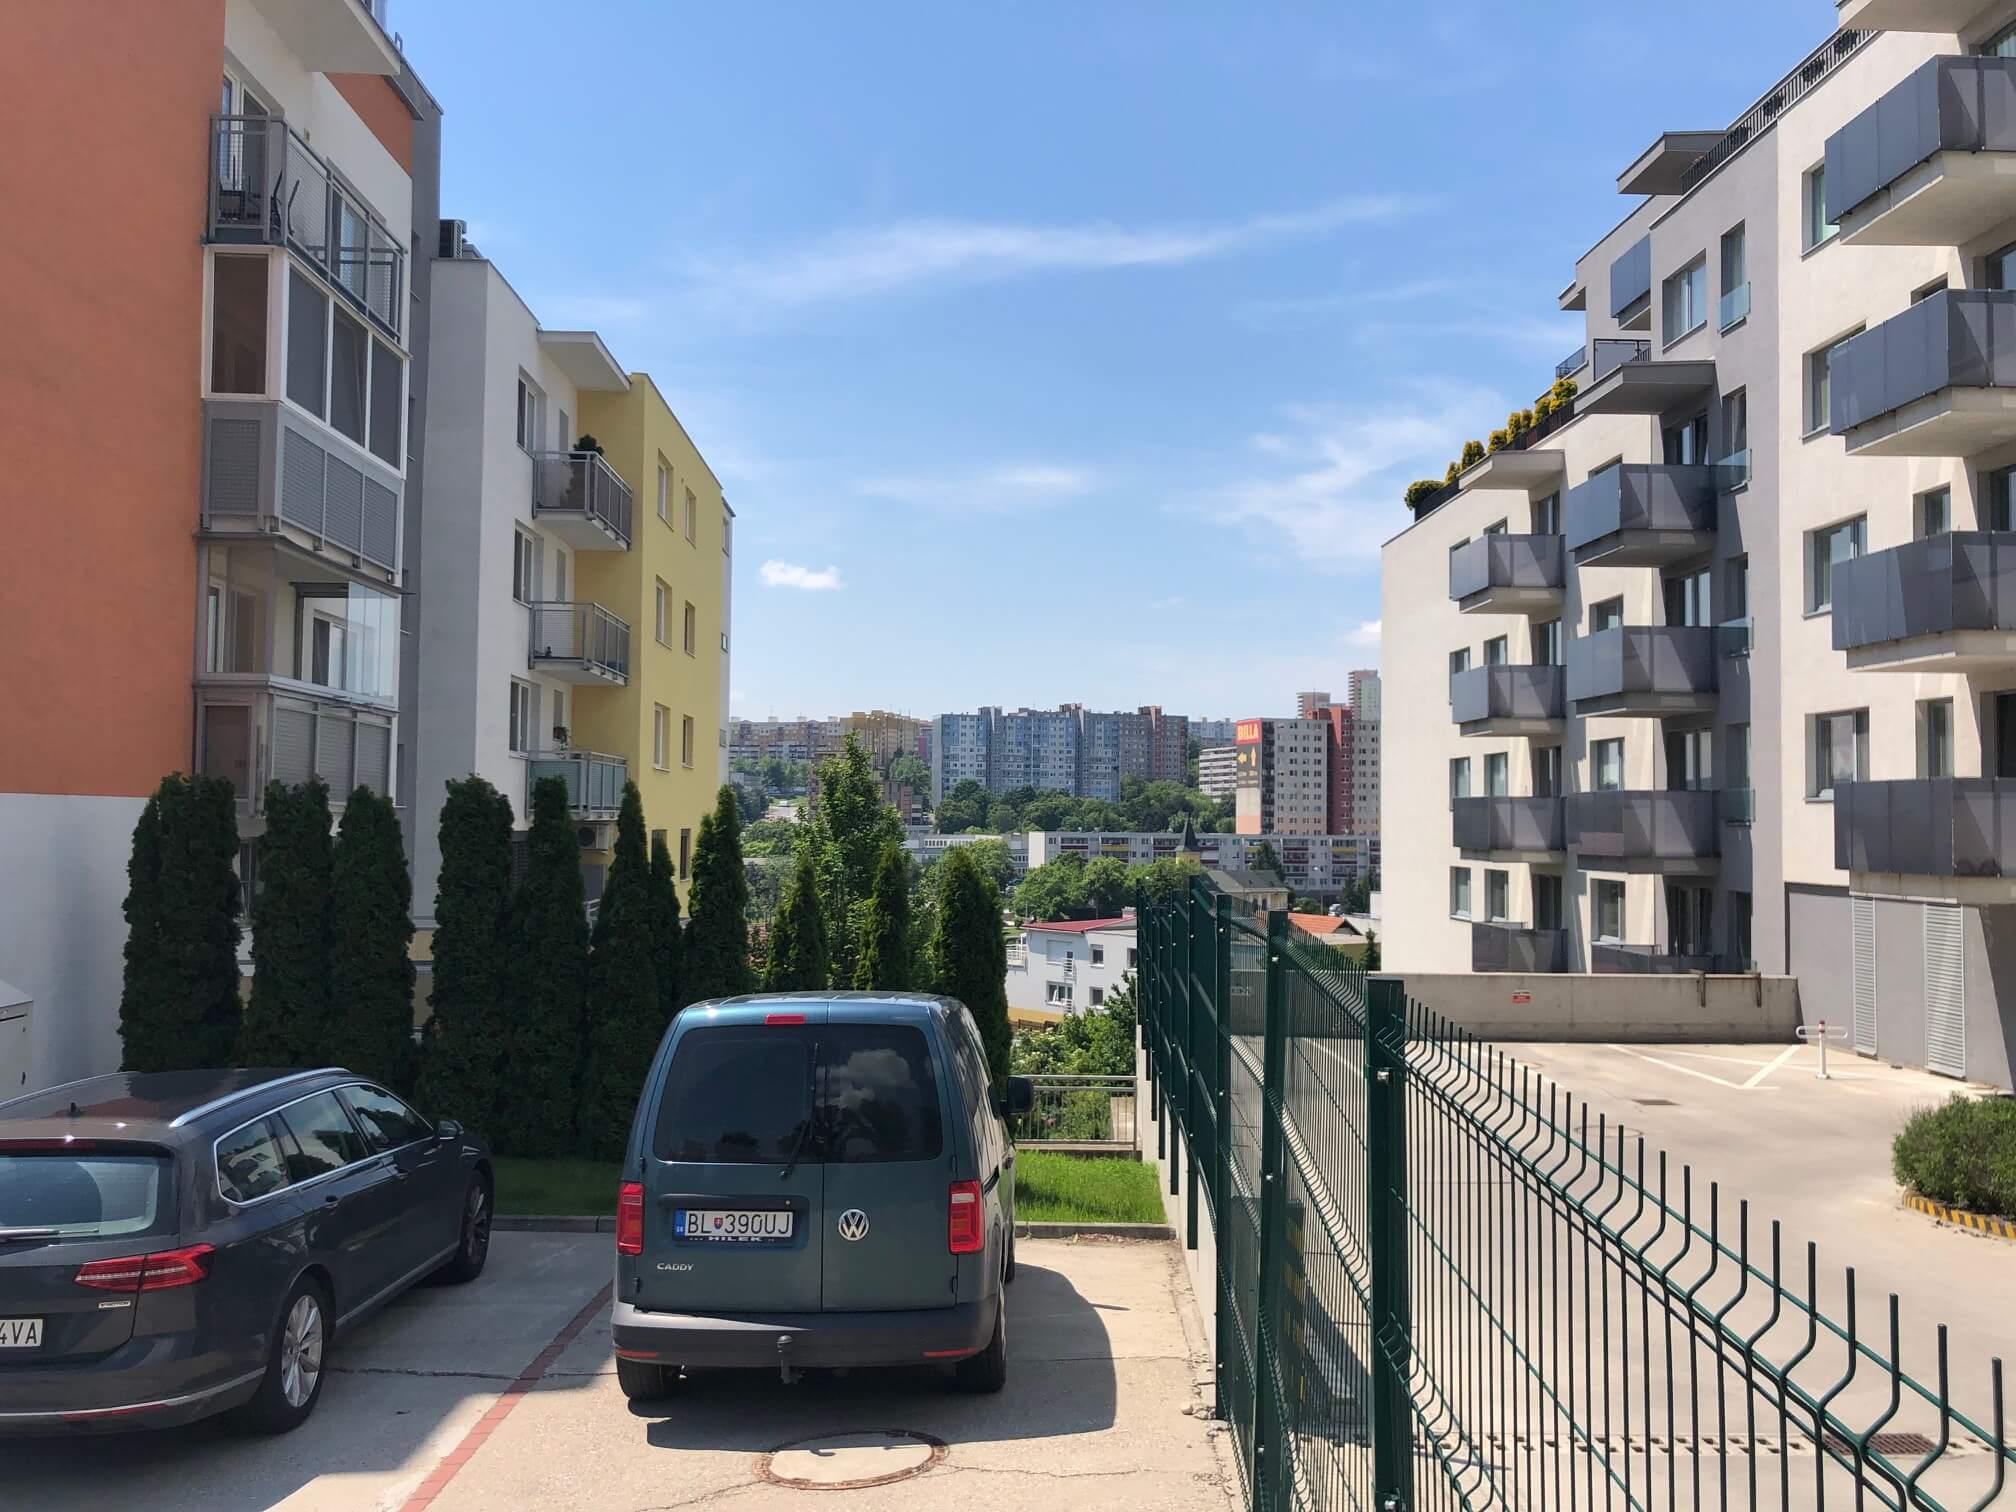 Rezervované: 3 izbový byt, novostavba, 72,25m2, loggia 4,82m2, Staré Grunty, Karlovka, garážové státie-68